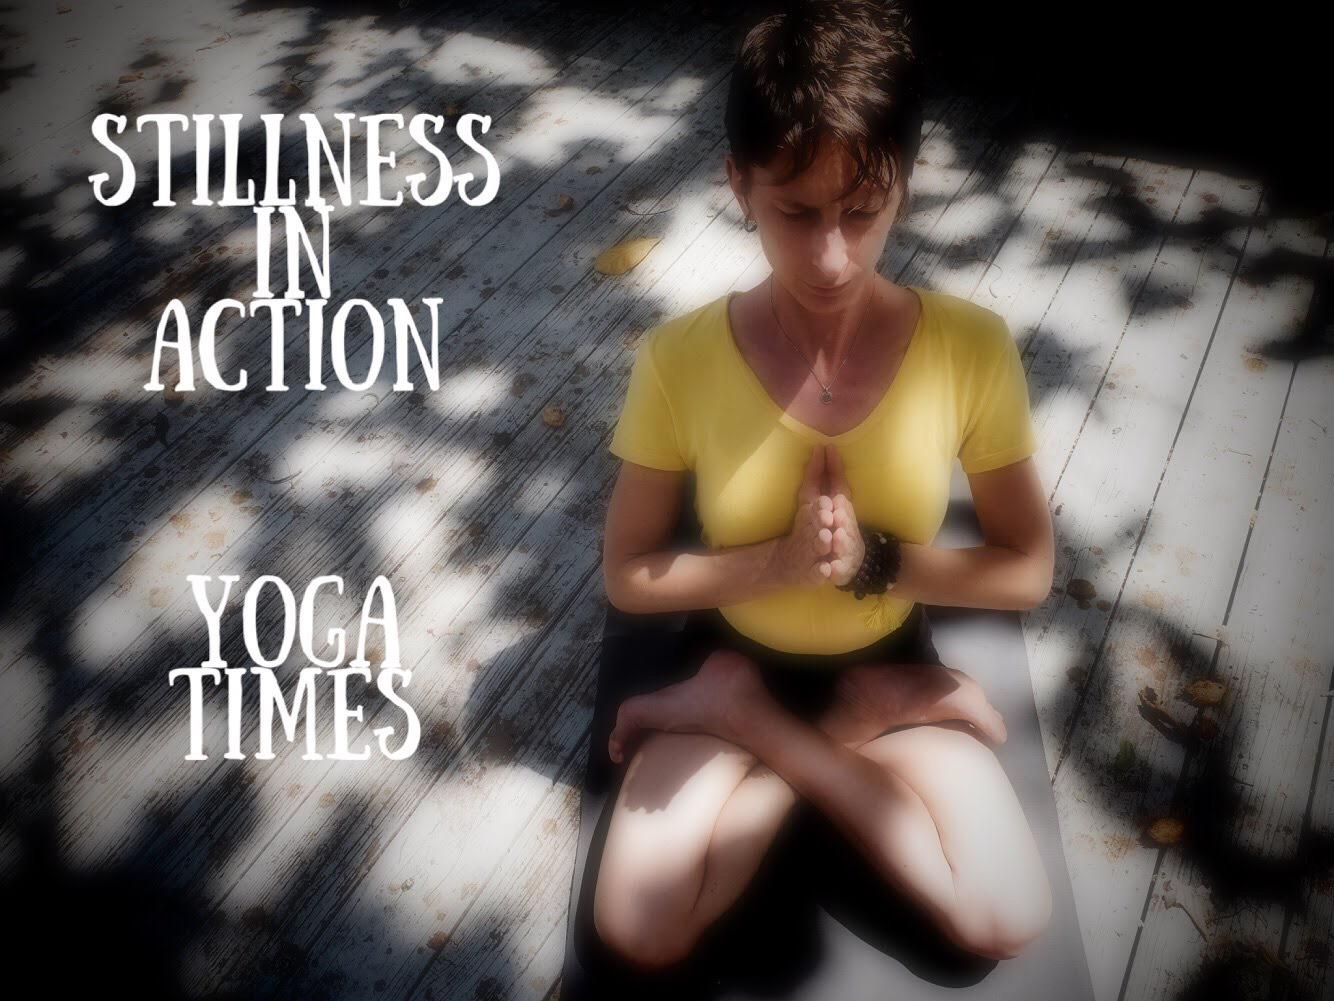 Lenka Gargalovicova Odlum talks about what yoga is. Saint Lucia yoga classes rodney bay near Royalton near Hilton harborClub